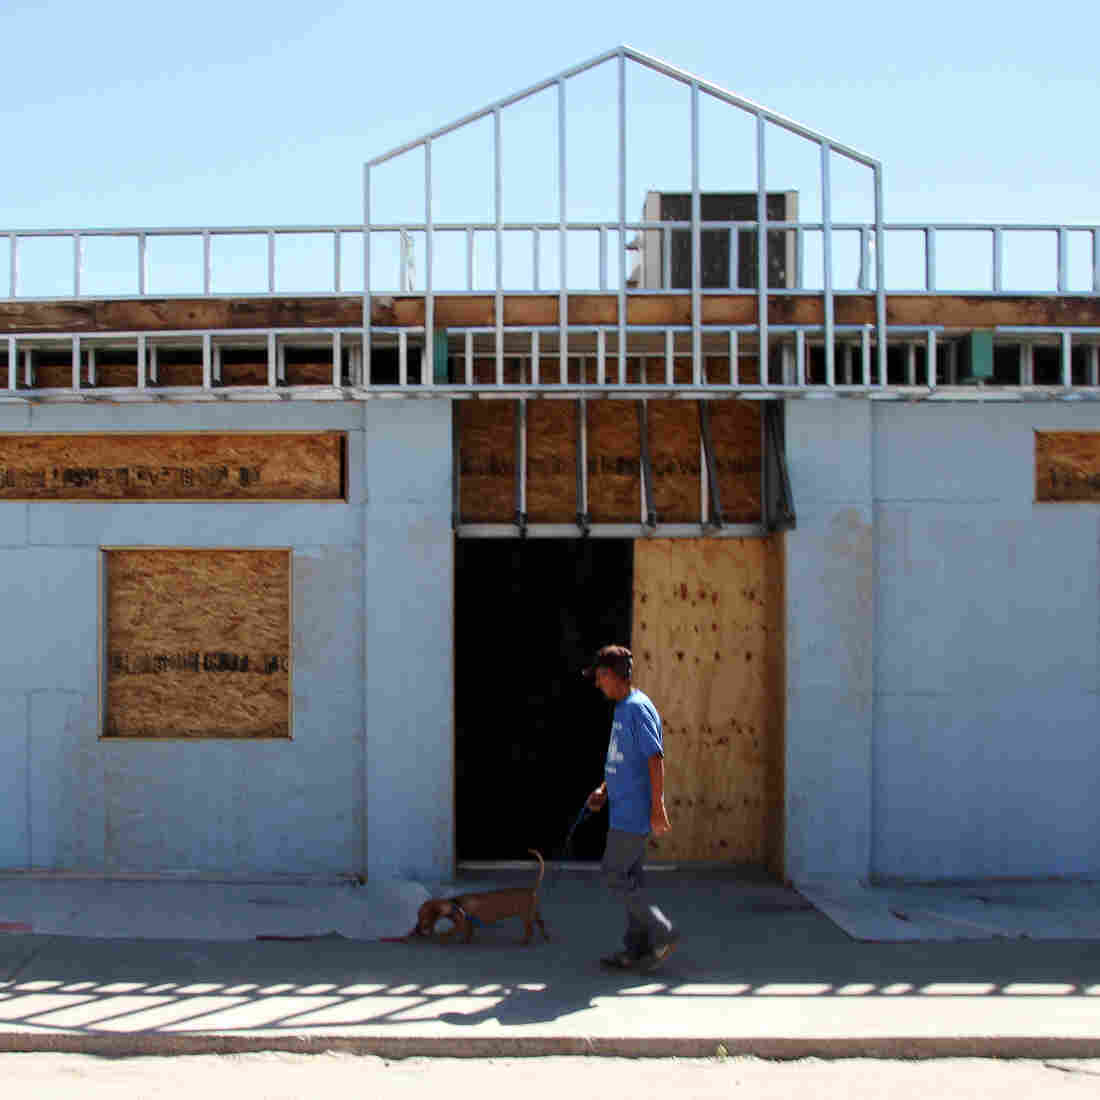 Despite Legal Reprieve On Abortion, Some Texas Clinics Remain Closed